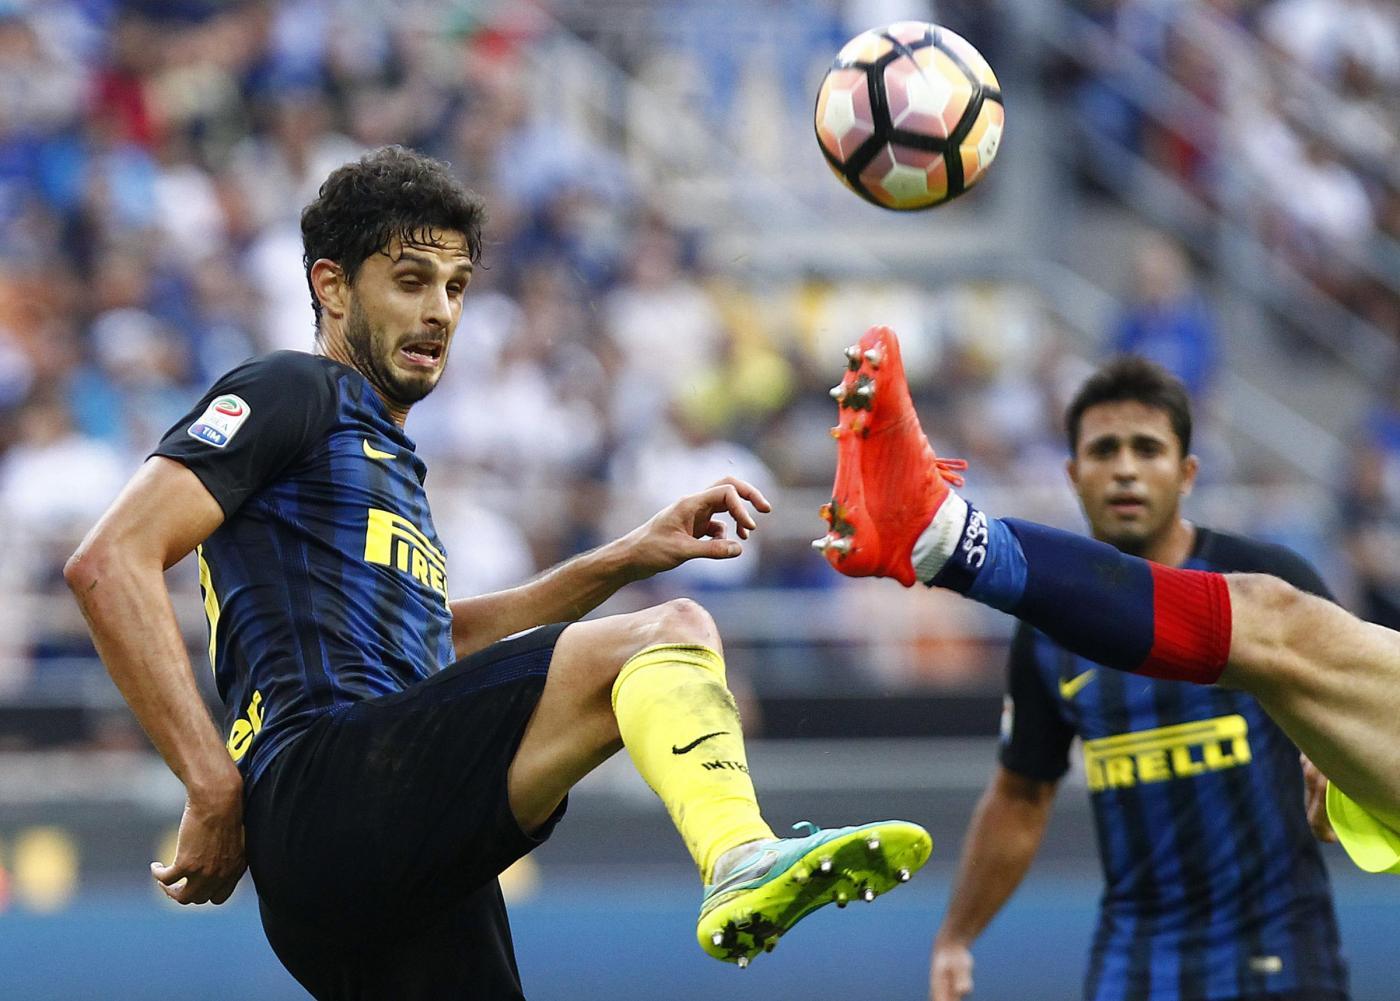 Palermo-Inter, Pioli: